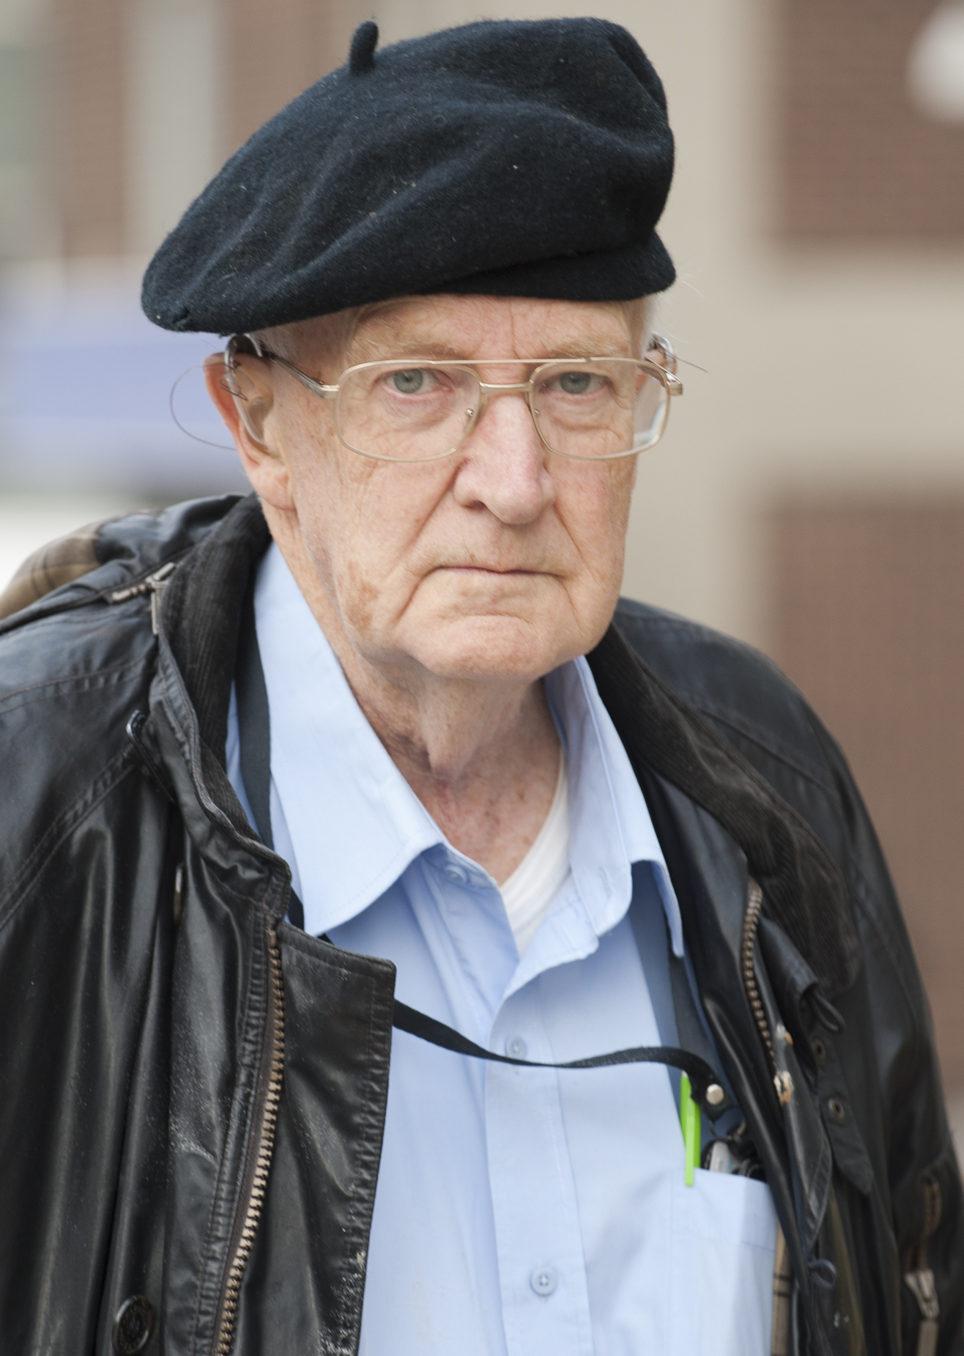 Senior cop 'harmed' by pensioner's letters